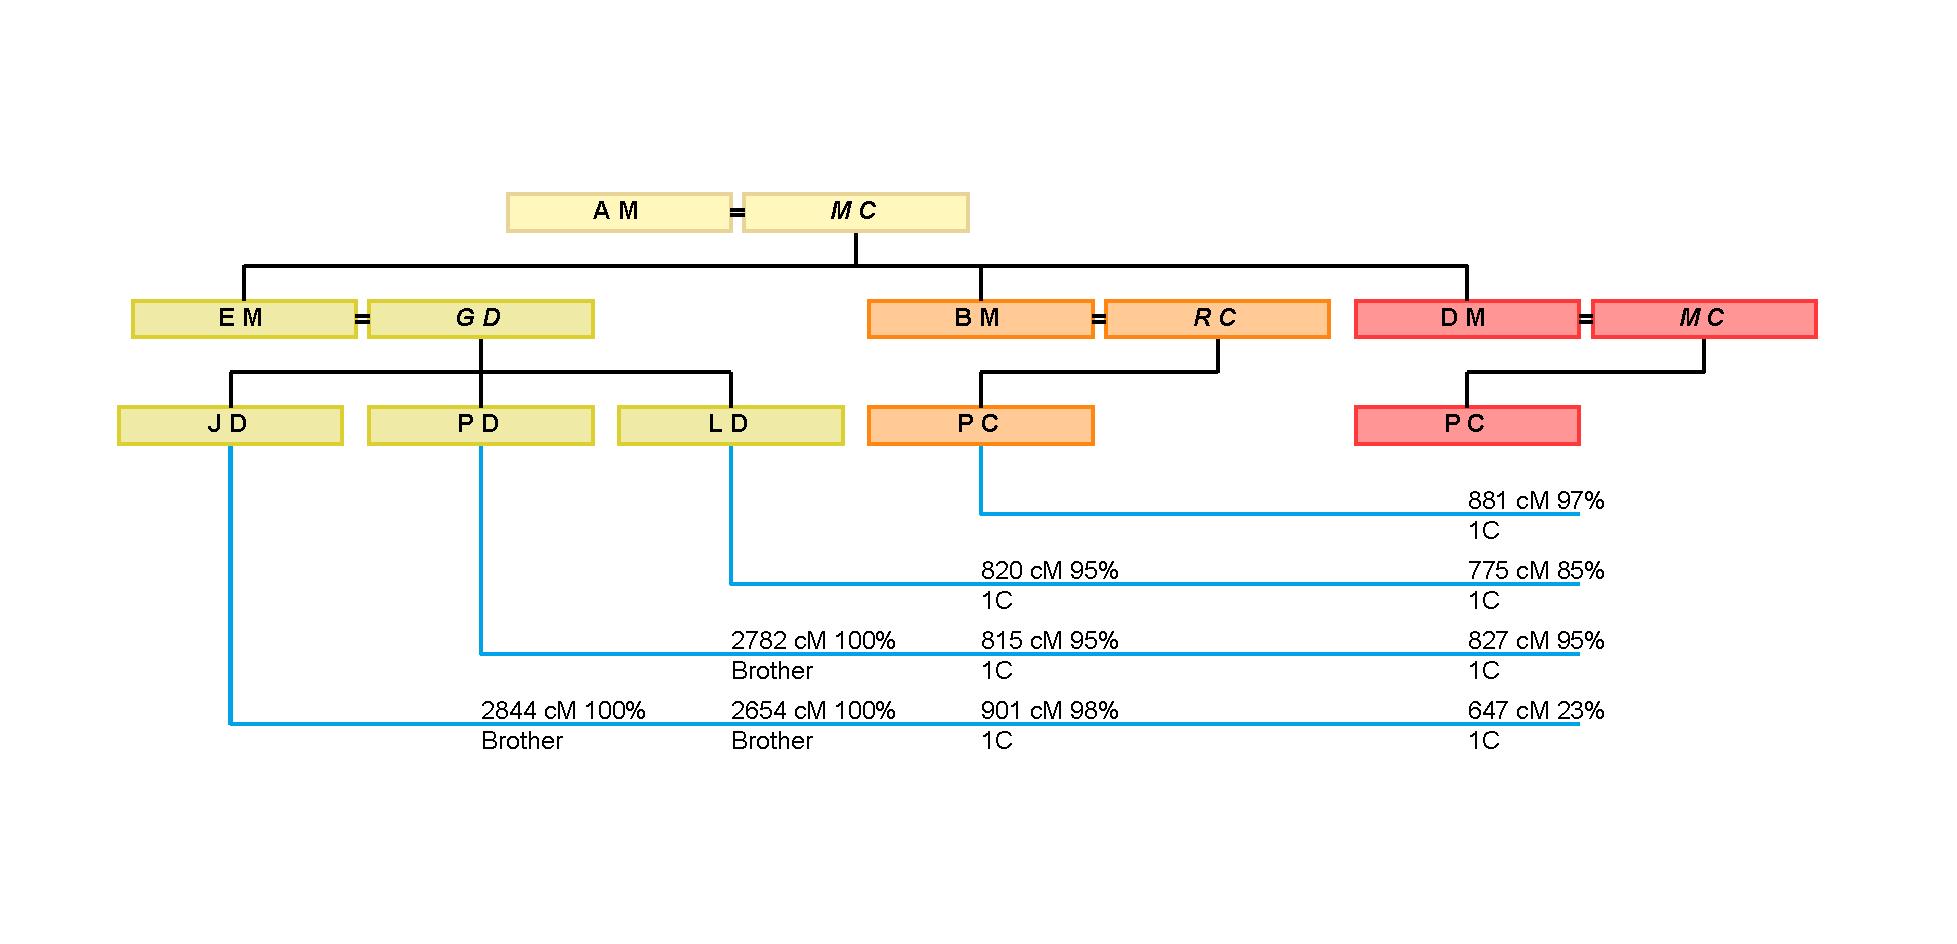 Software Mackiev International Store Logic Gate Diagram In Gorgeous Schematic Dna Matrix